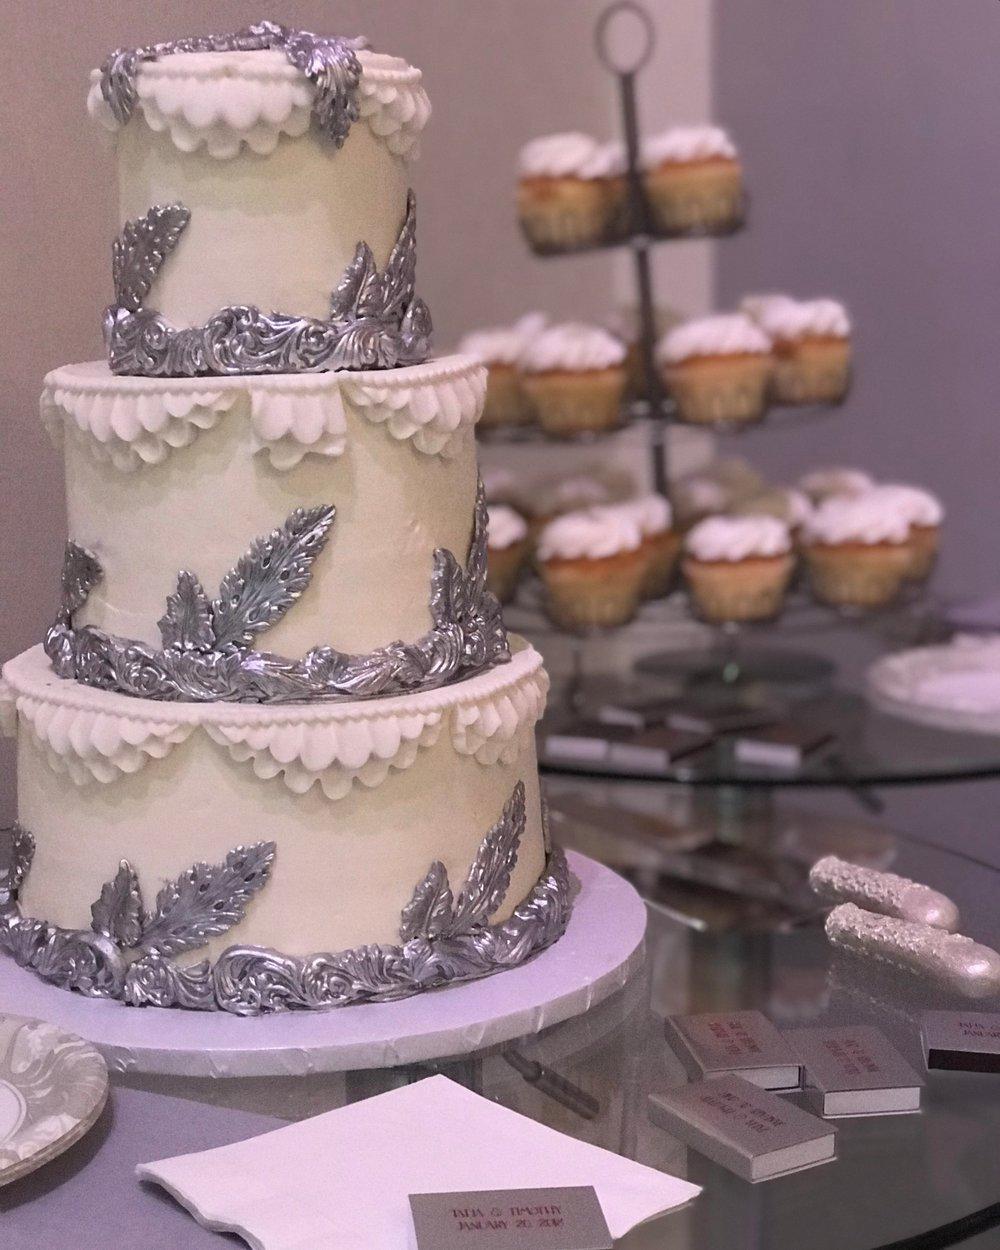 Silver & White Baroque Wedding Cake - Mwokaji Cakery .jpg